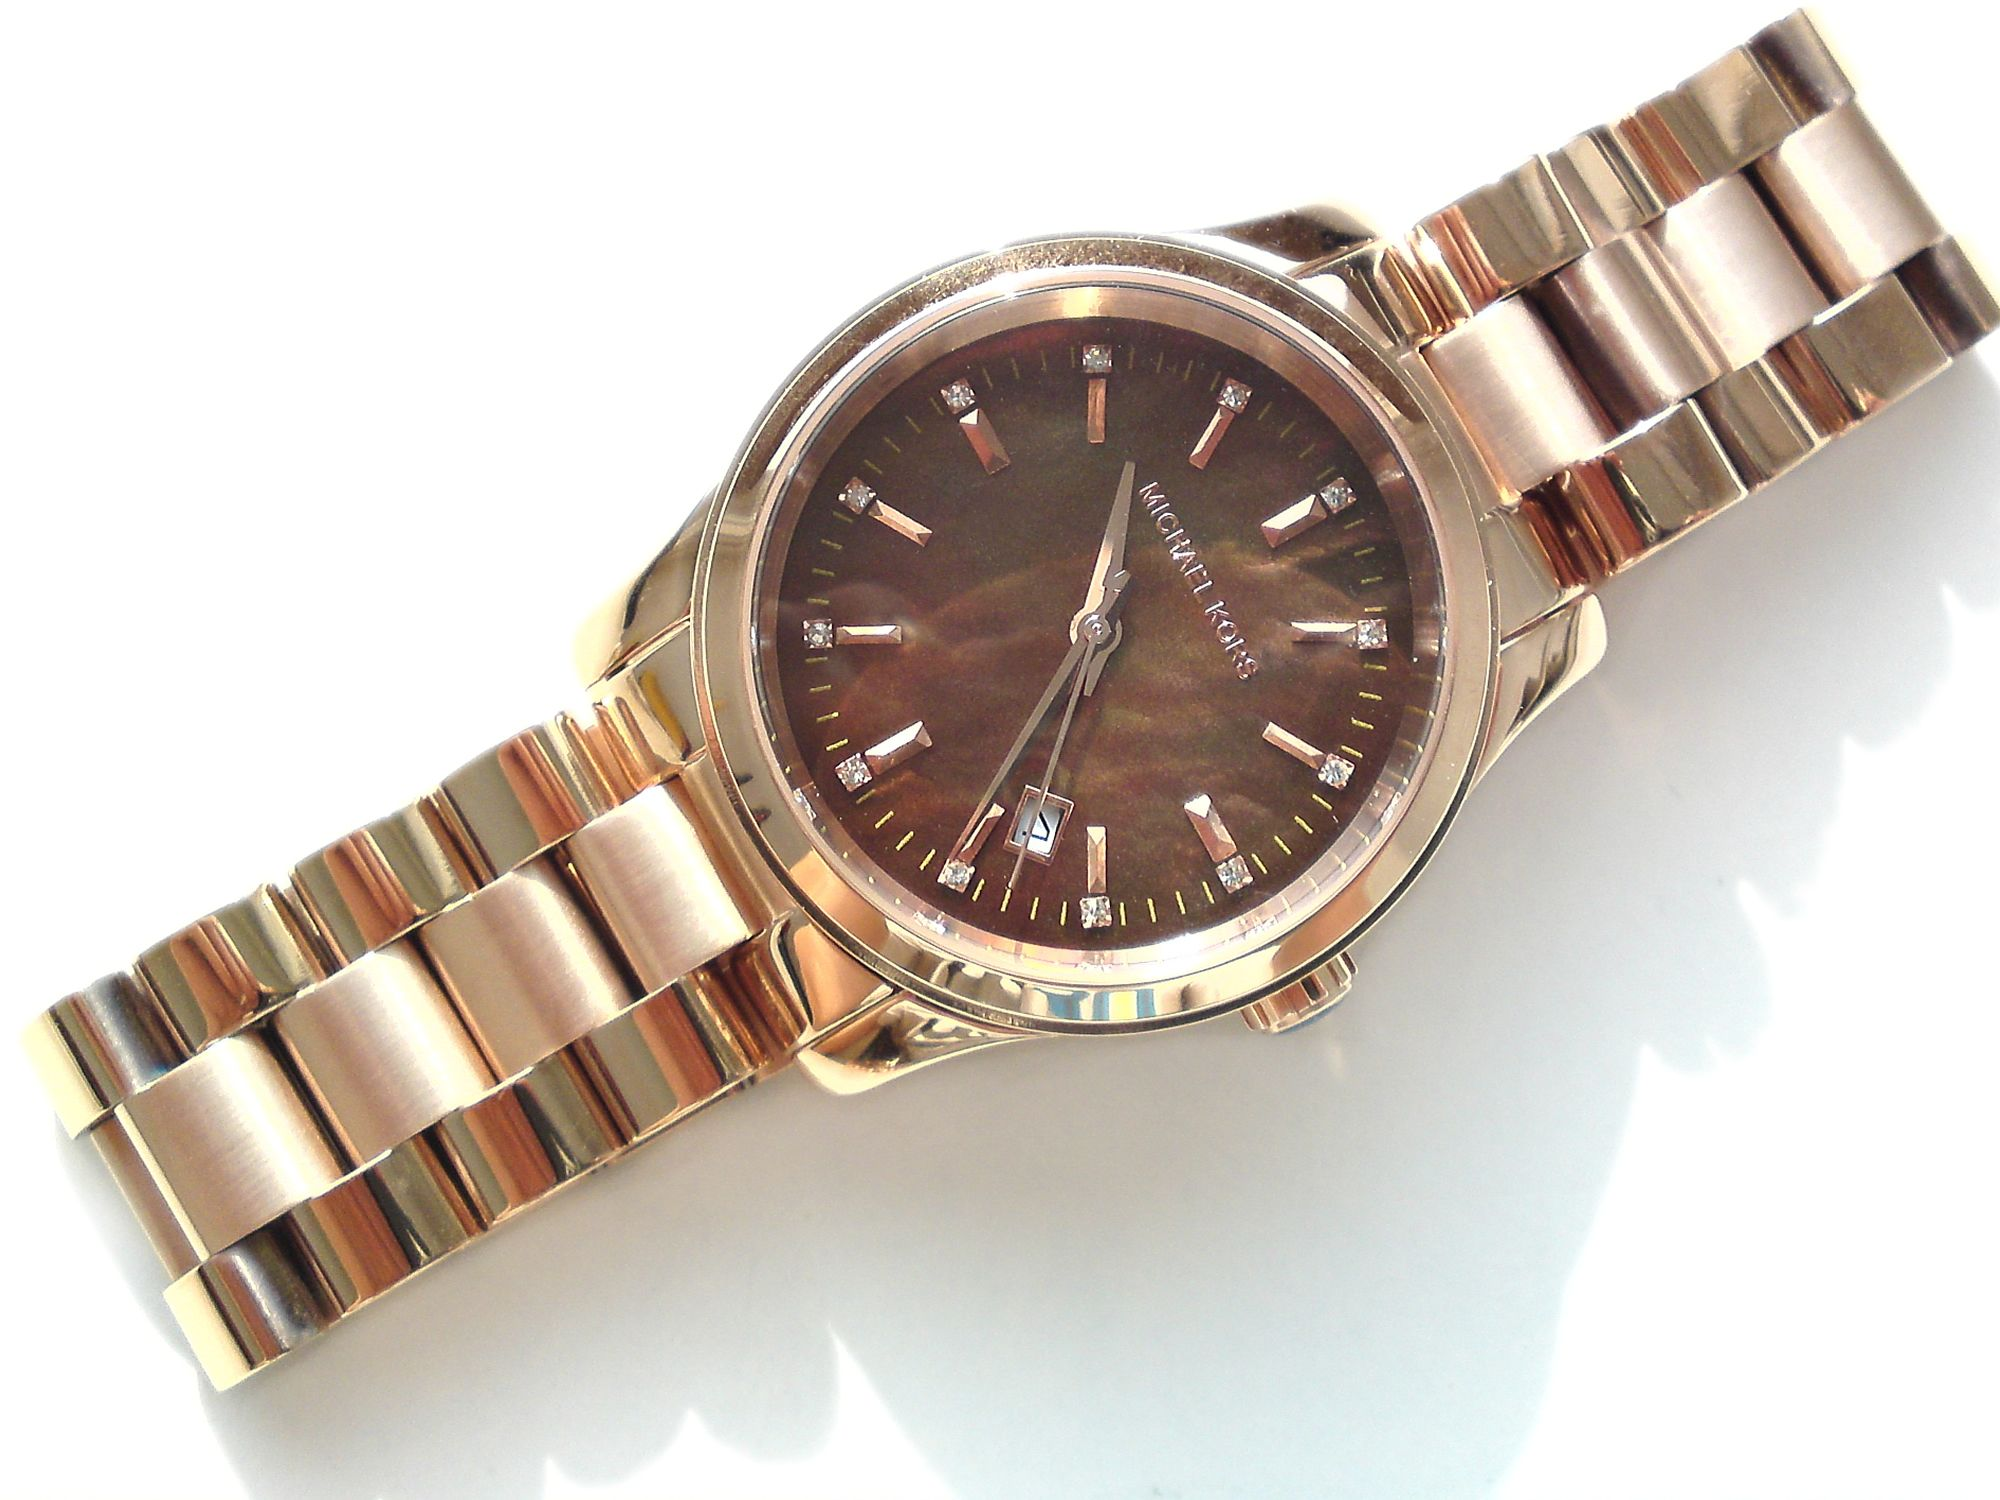 michael kors damen armband uhr chronograph rose vergoldet braun mk5445 neu ebay. Black Bedroom Furniture Sets. Home Design Ideas